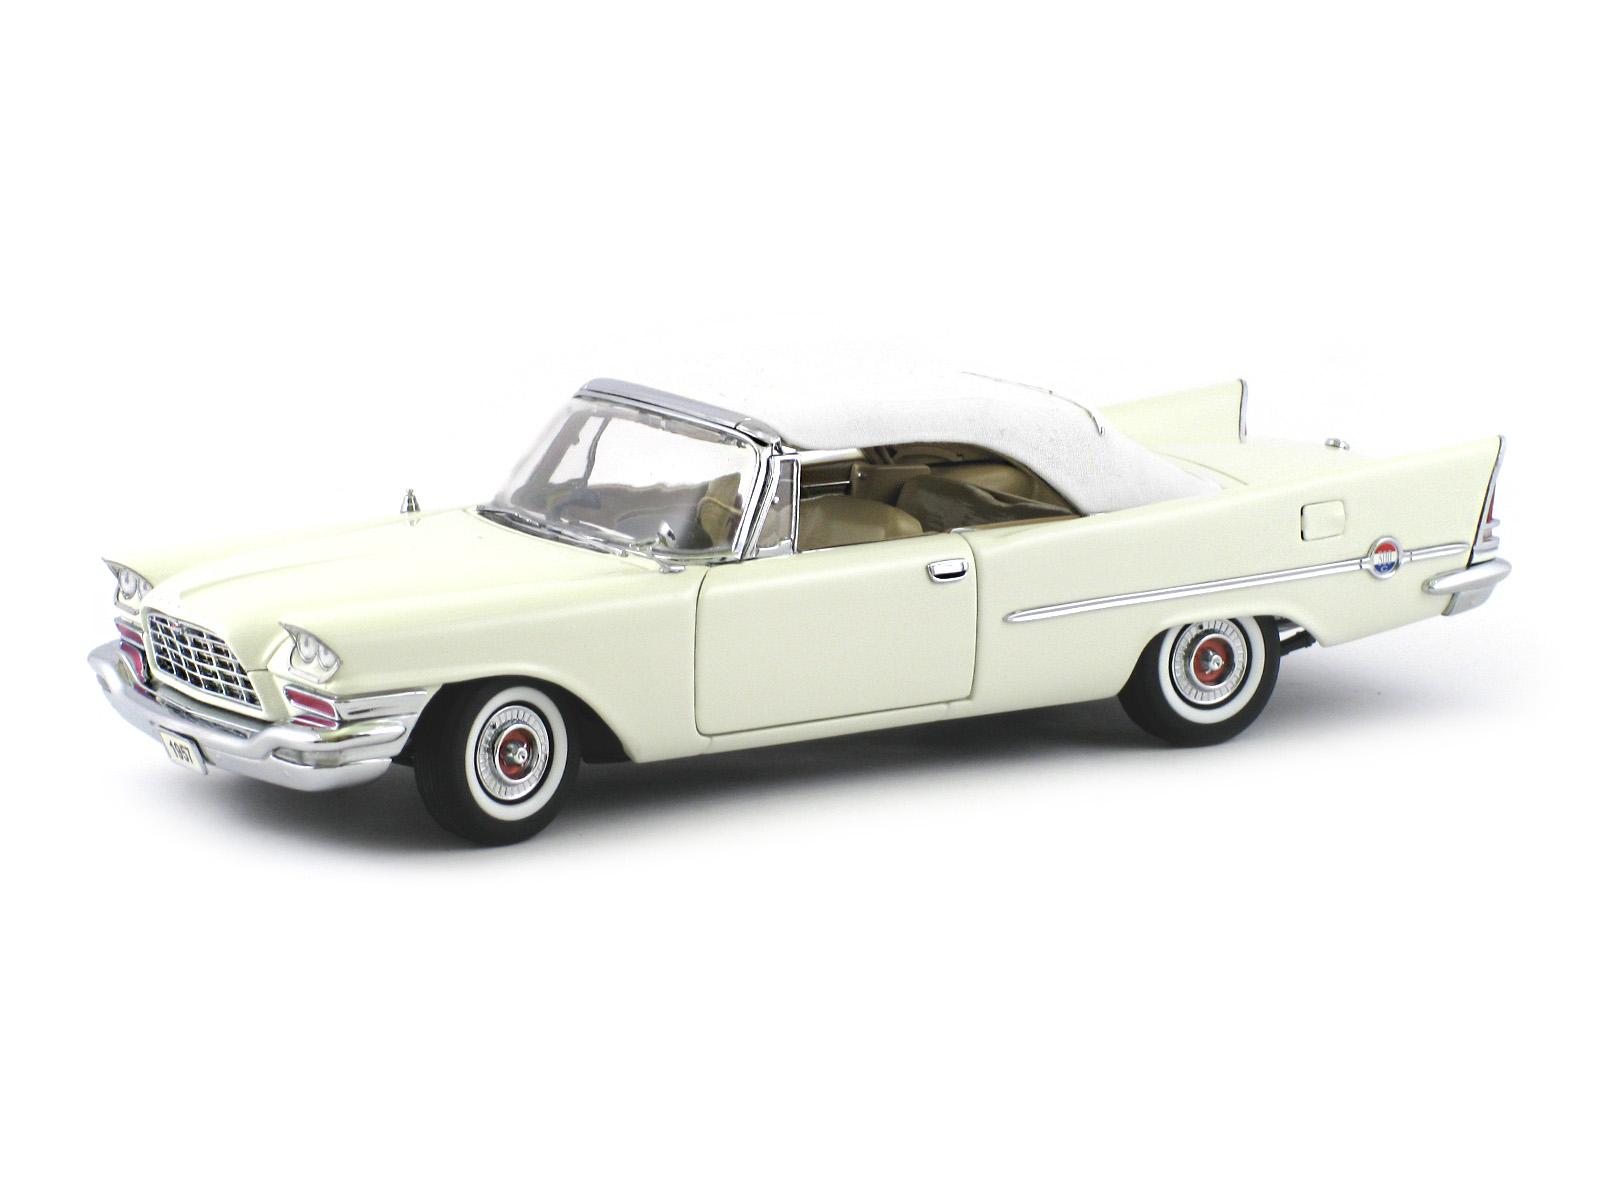 1957 Chrysler 300 Convertible Danbury Mint